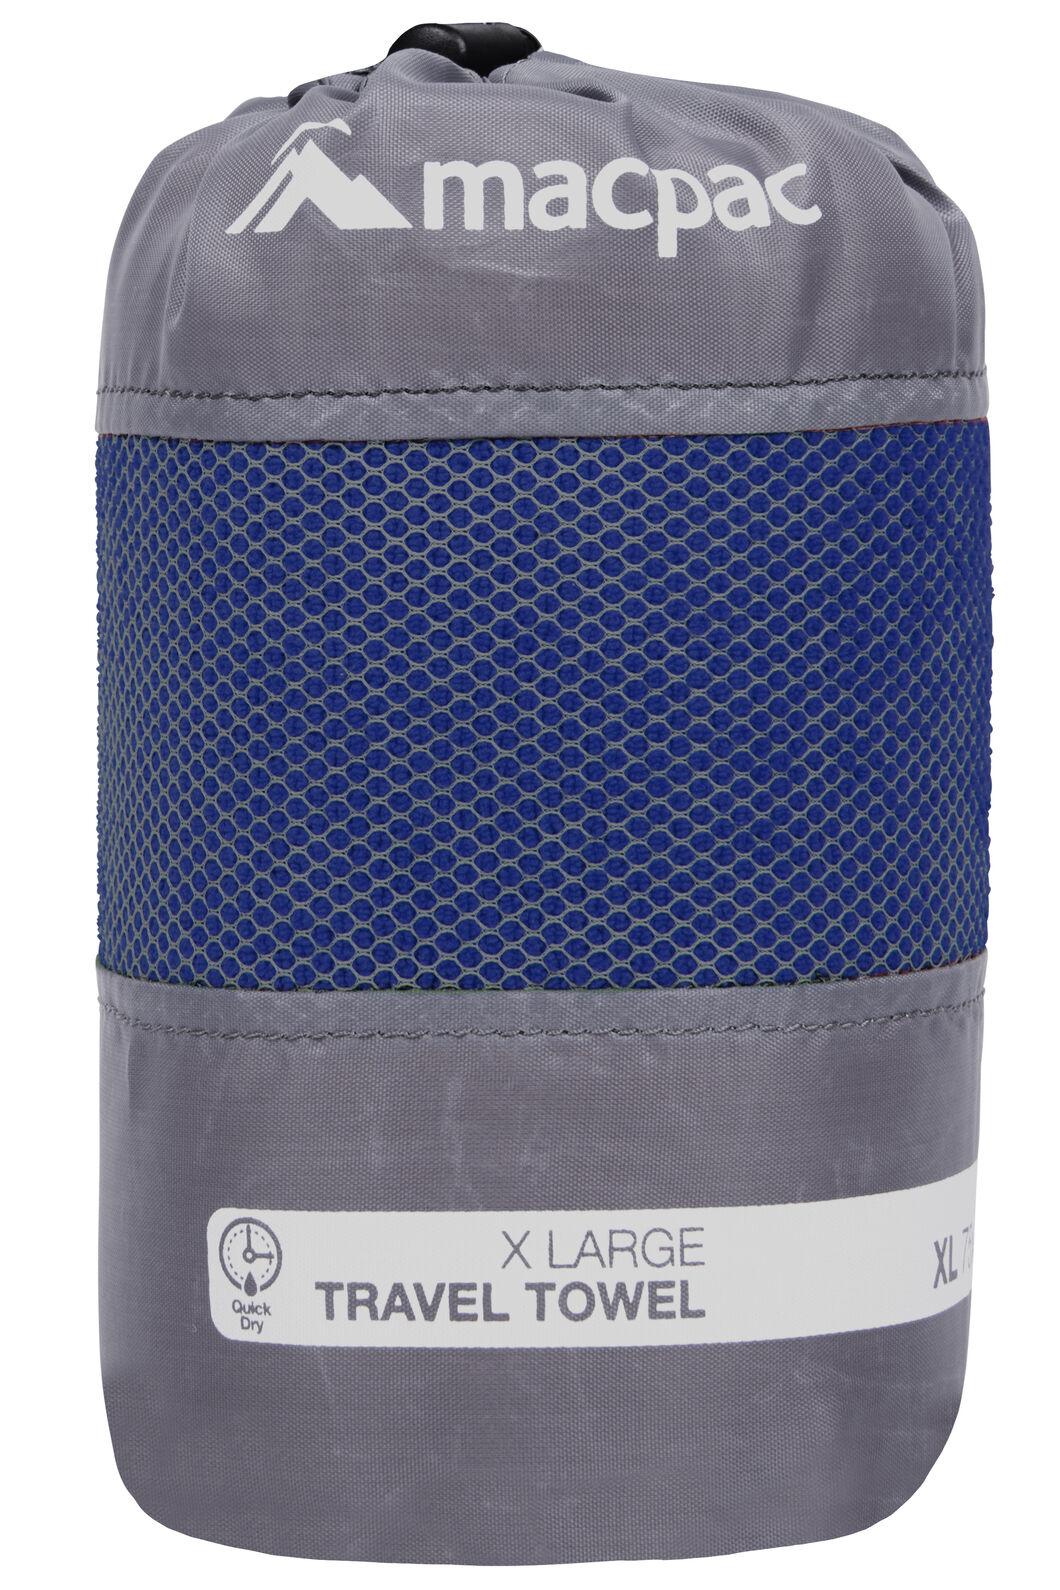 Macpac Travel Towel XL, Sodalite Blue, hi-res